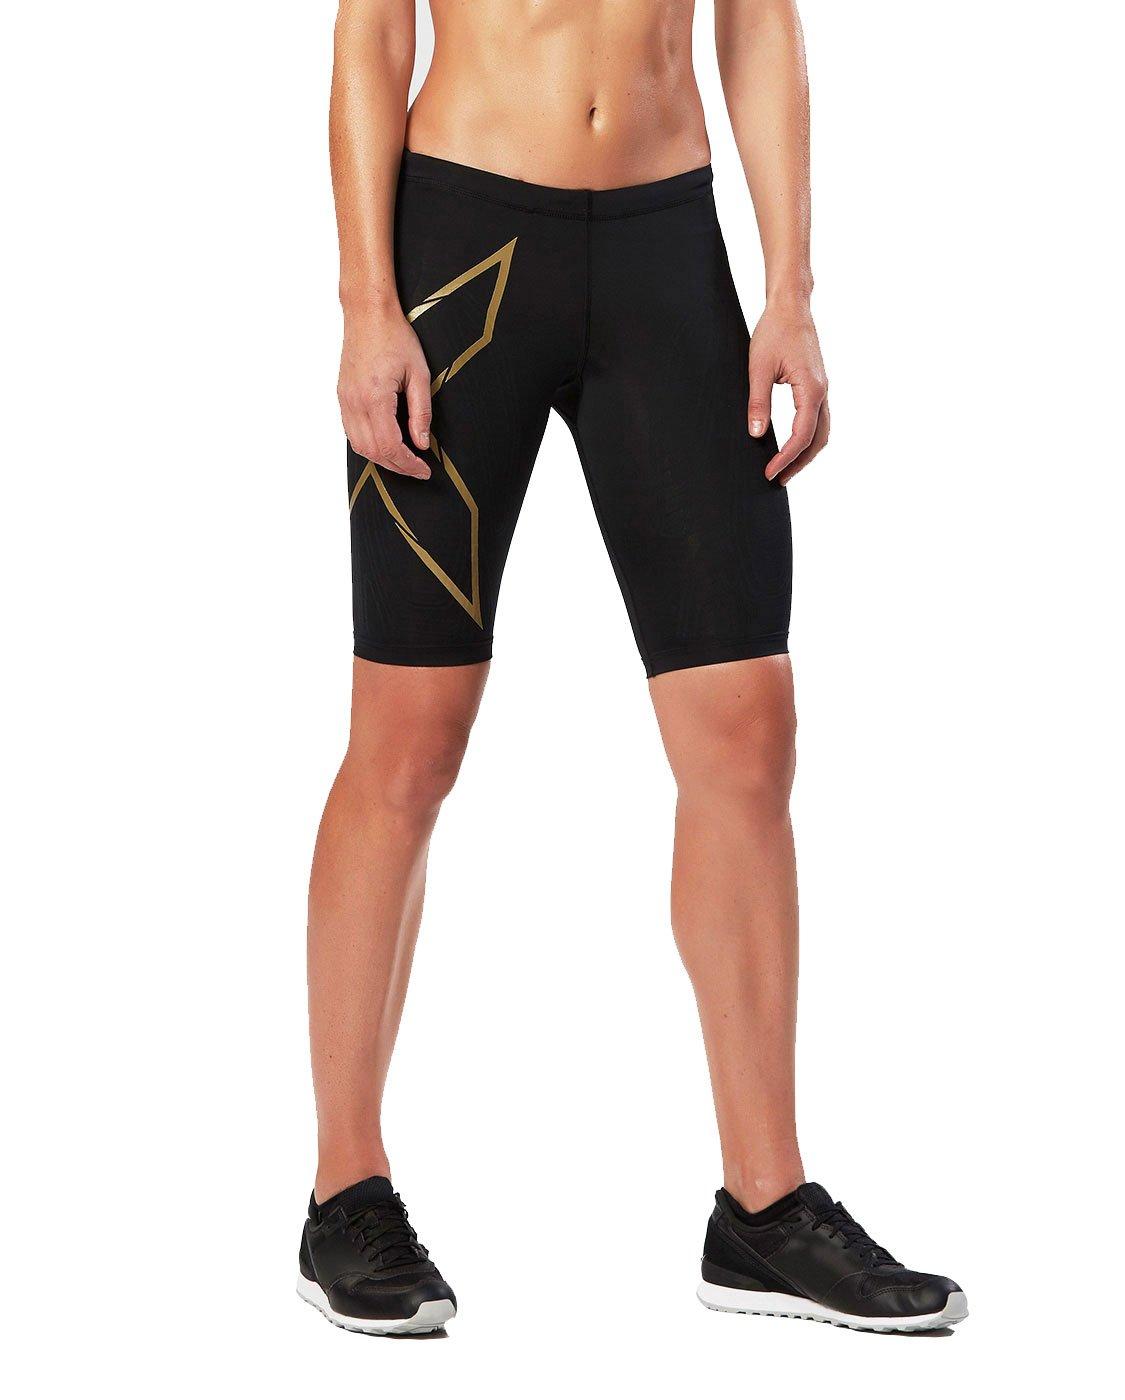 2XU Women's Elite MCS Compression Shorts, Black/Gold, X-Small